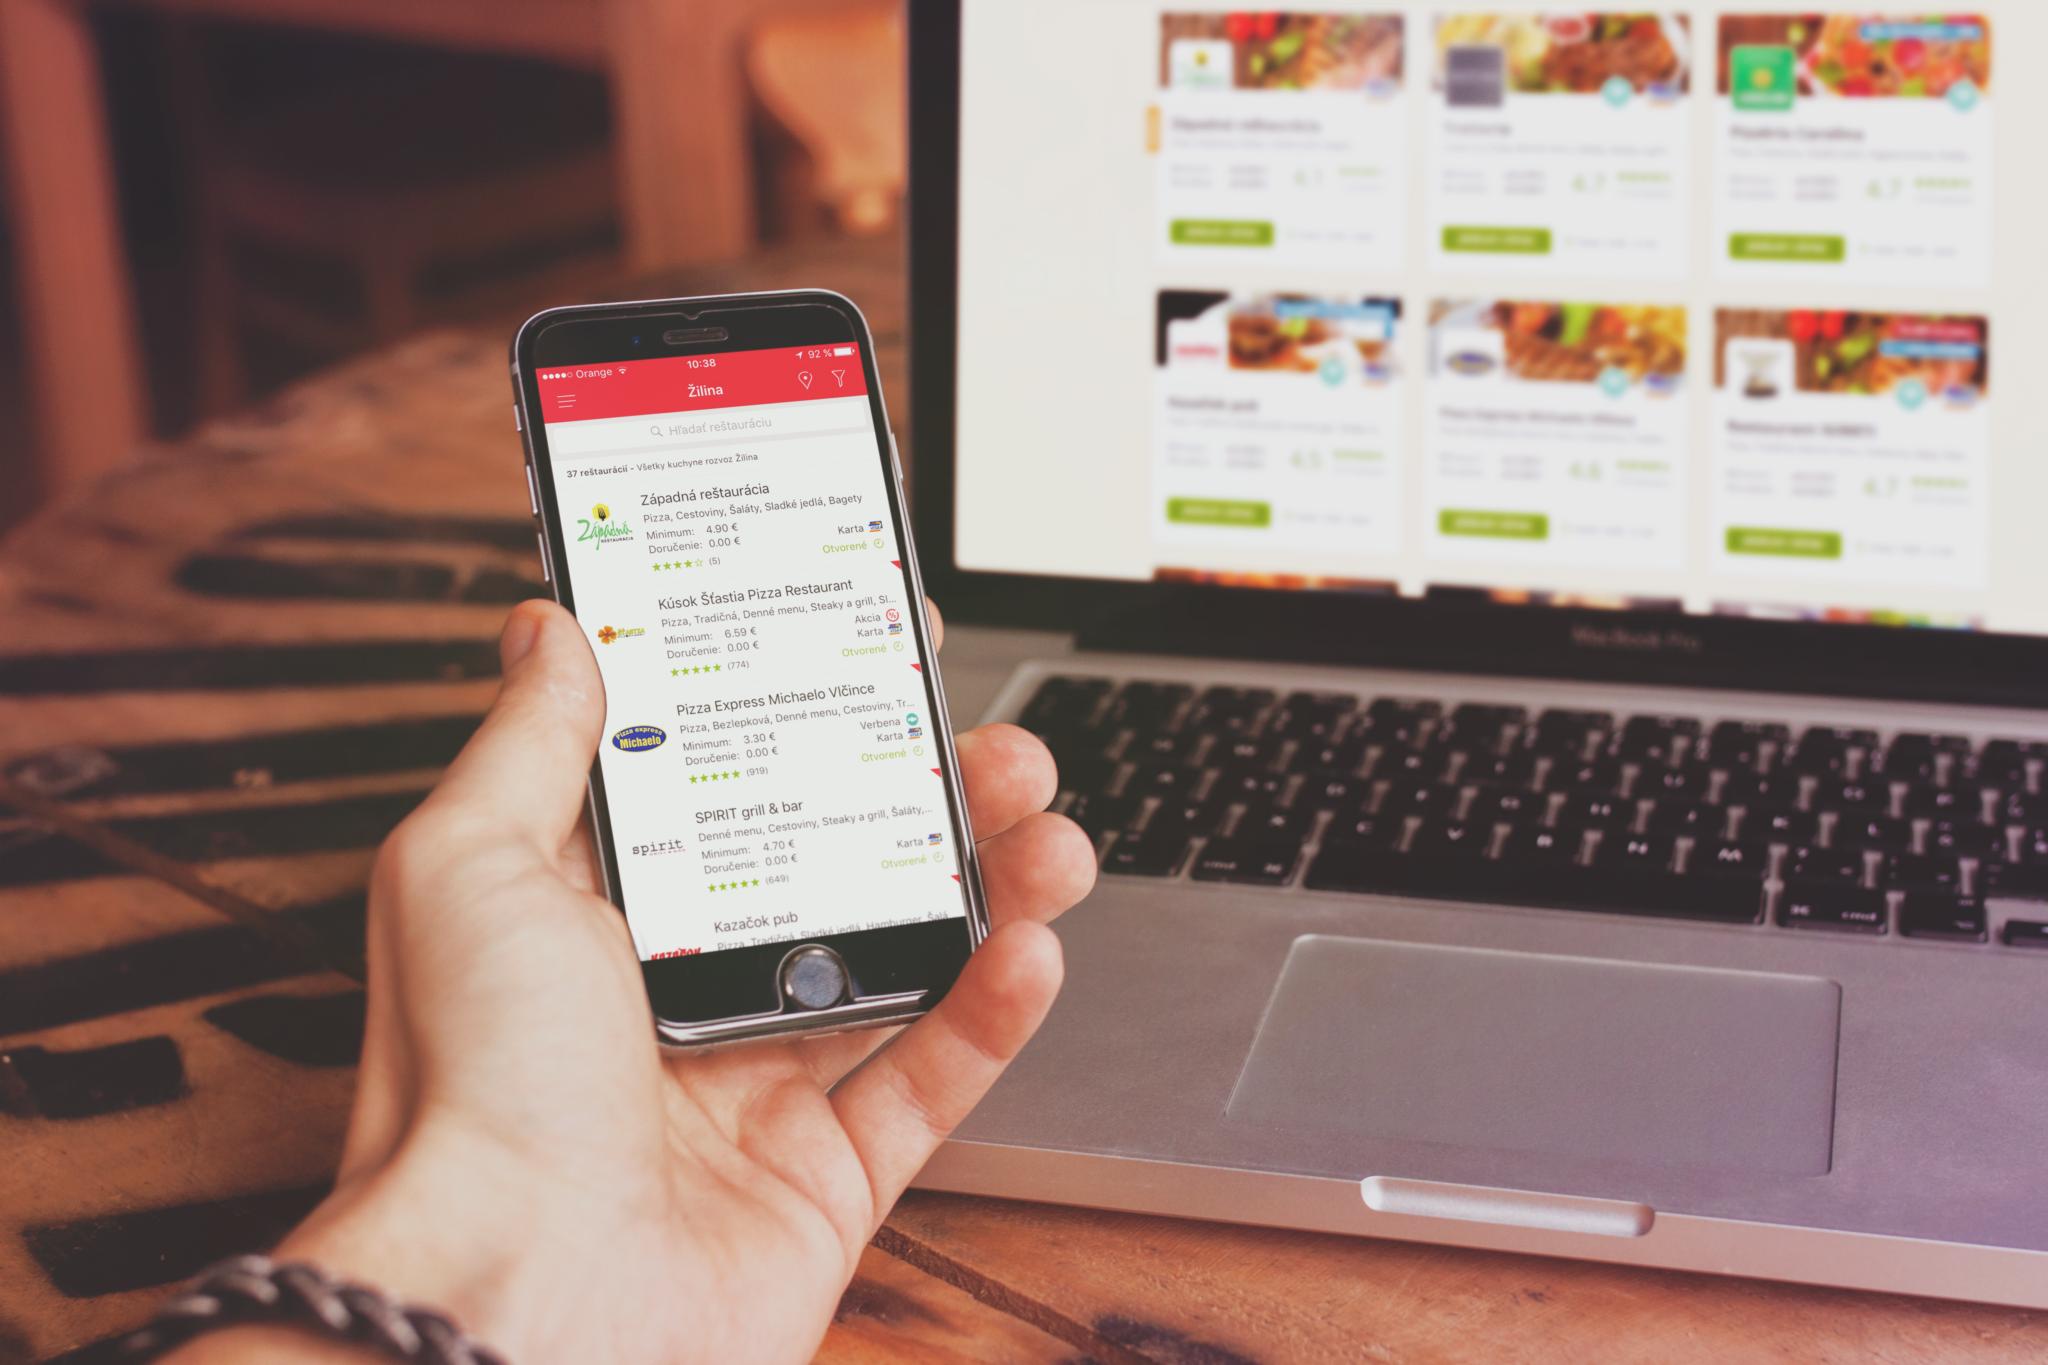 mobilna-aplikacia-vs-responzivna-webstrank